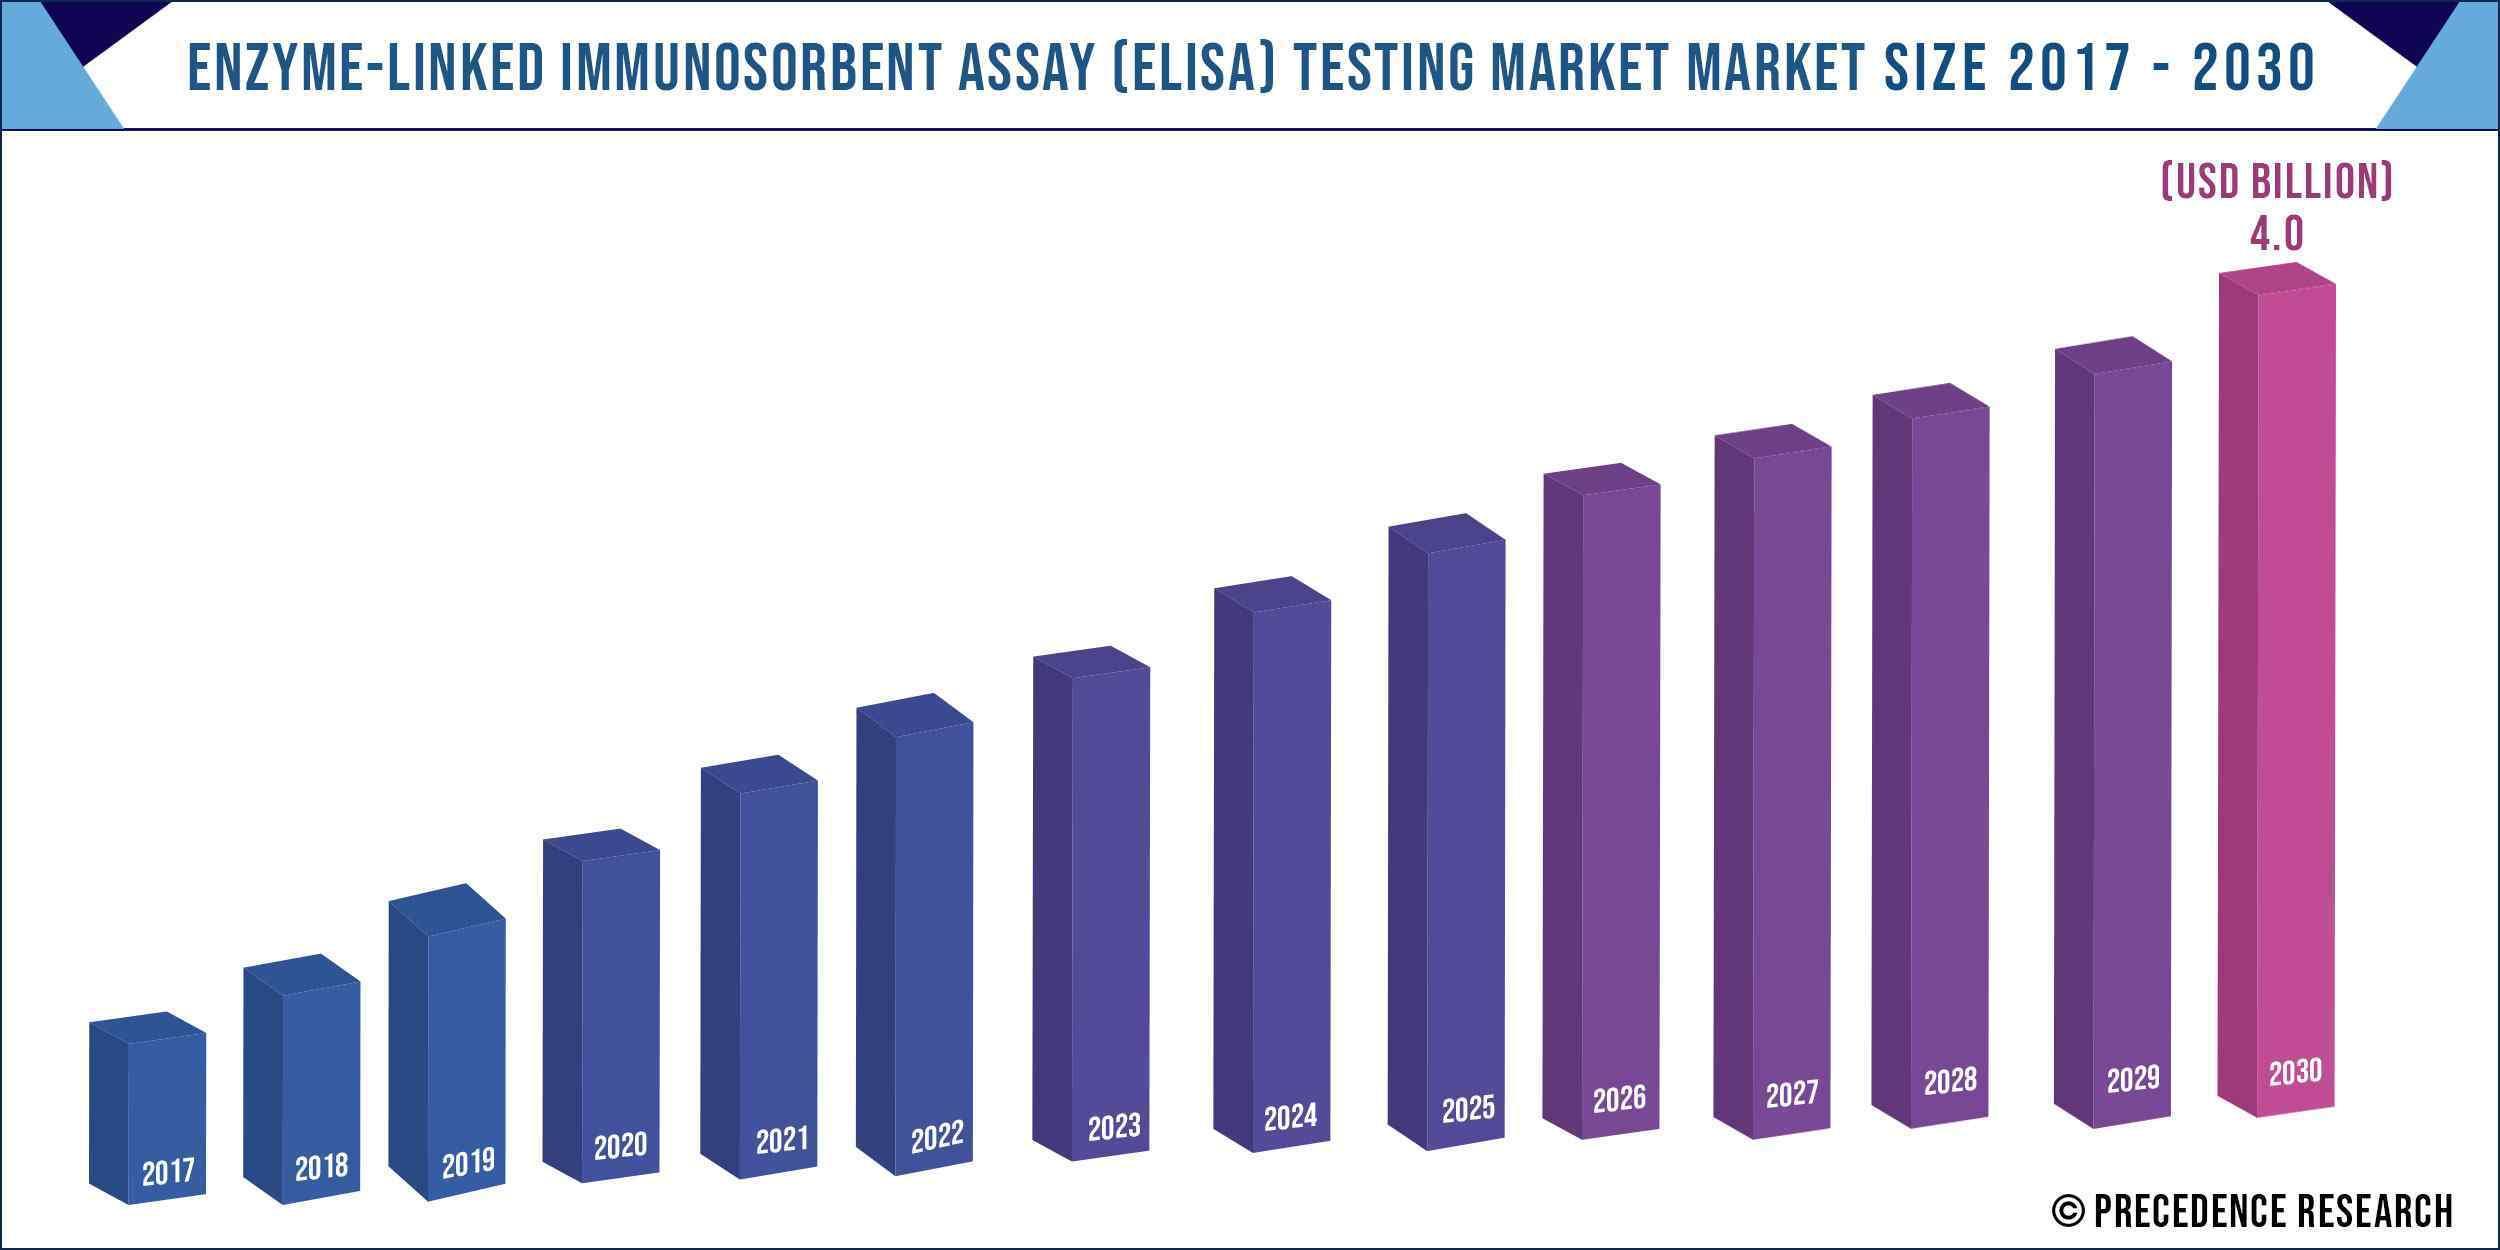 Enzyme Linked Immunosorbent Assay Testing Market Size 2017-2030